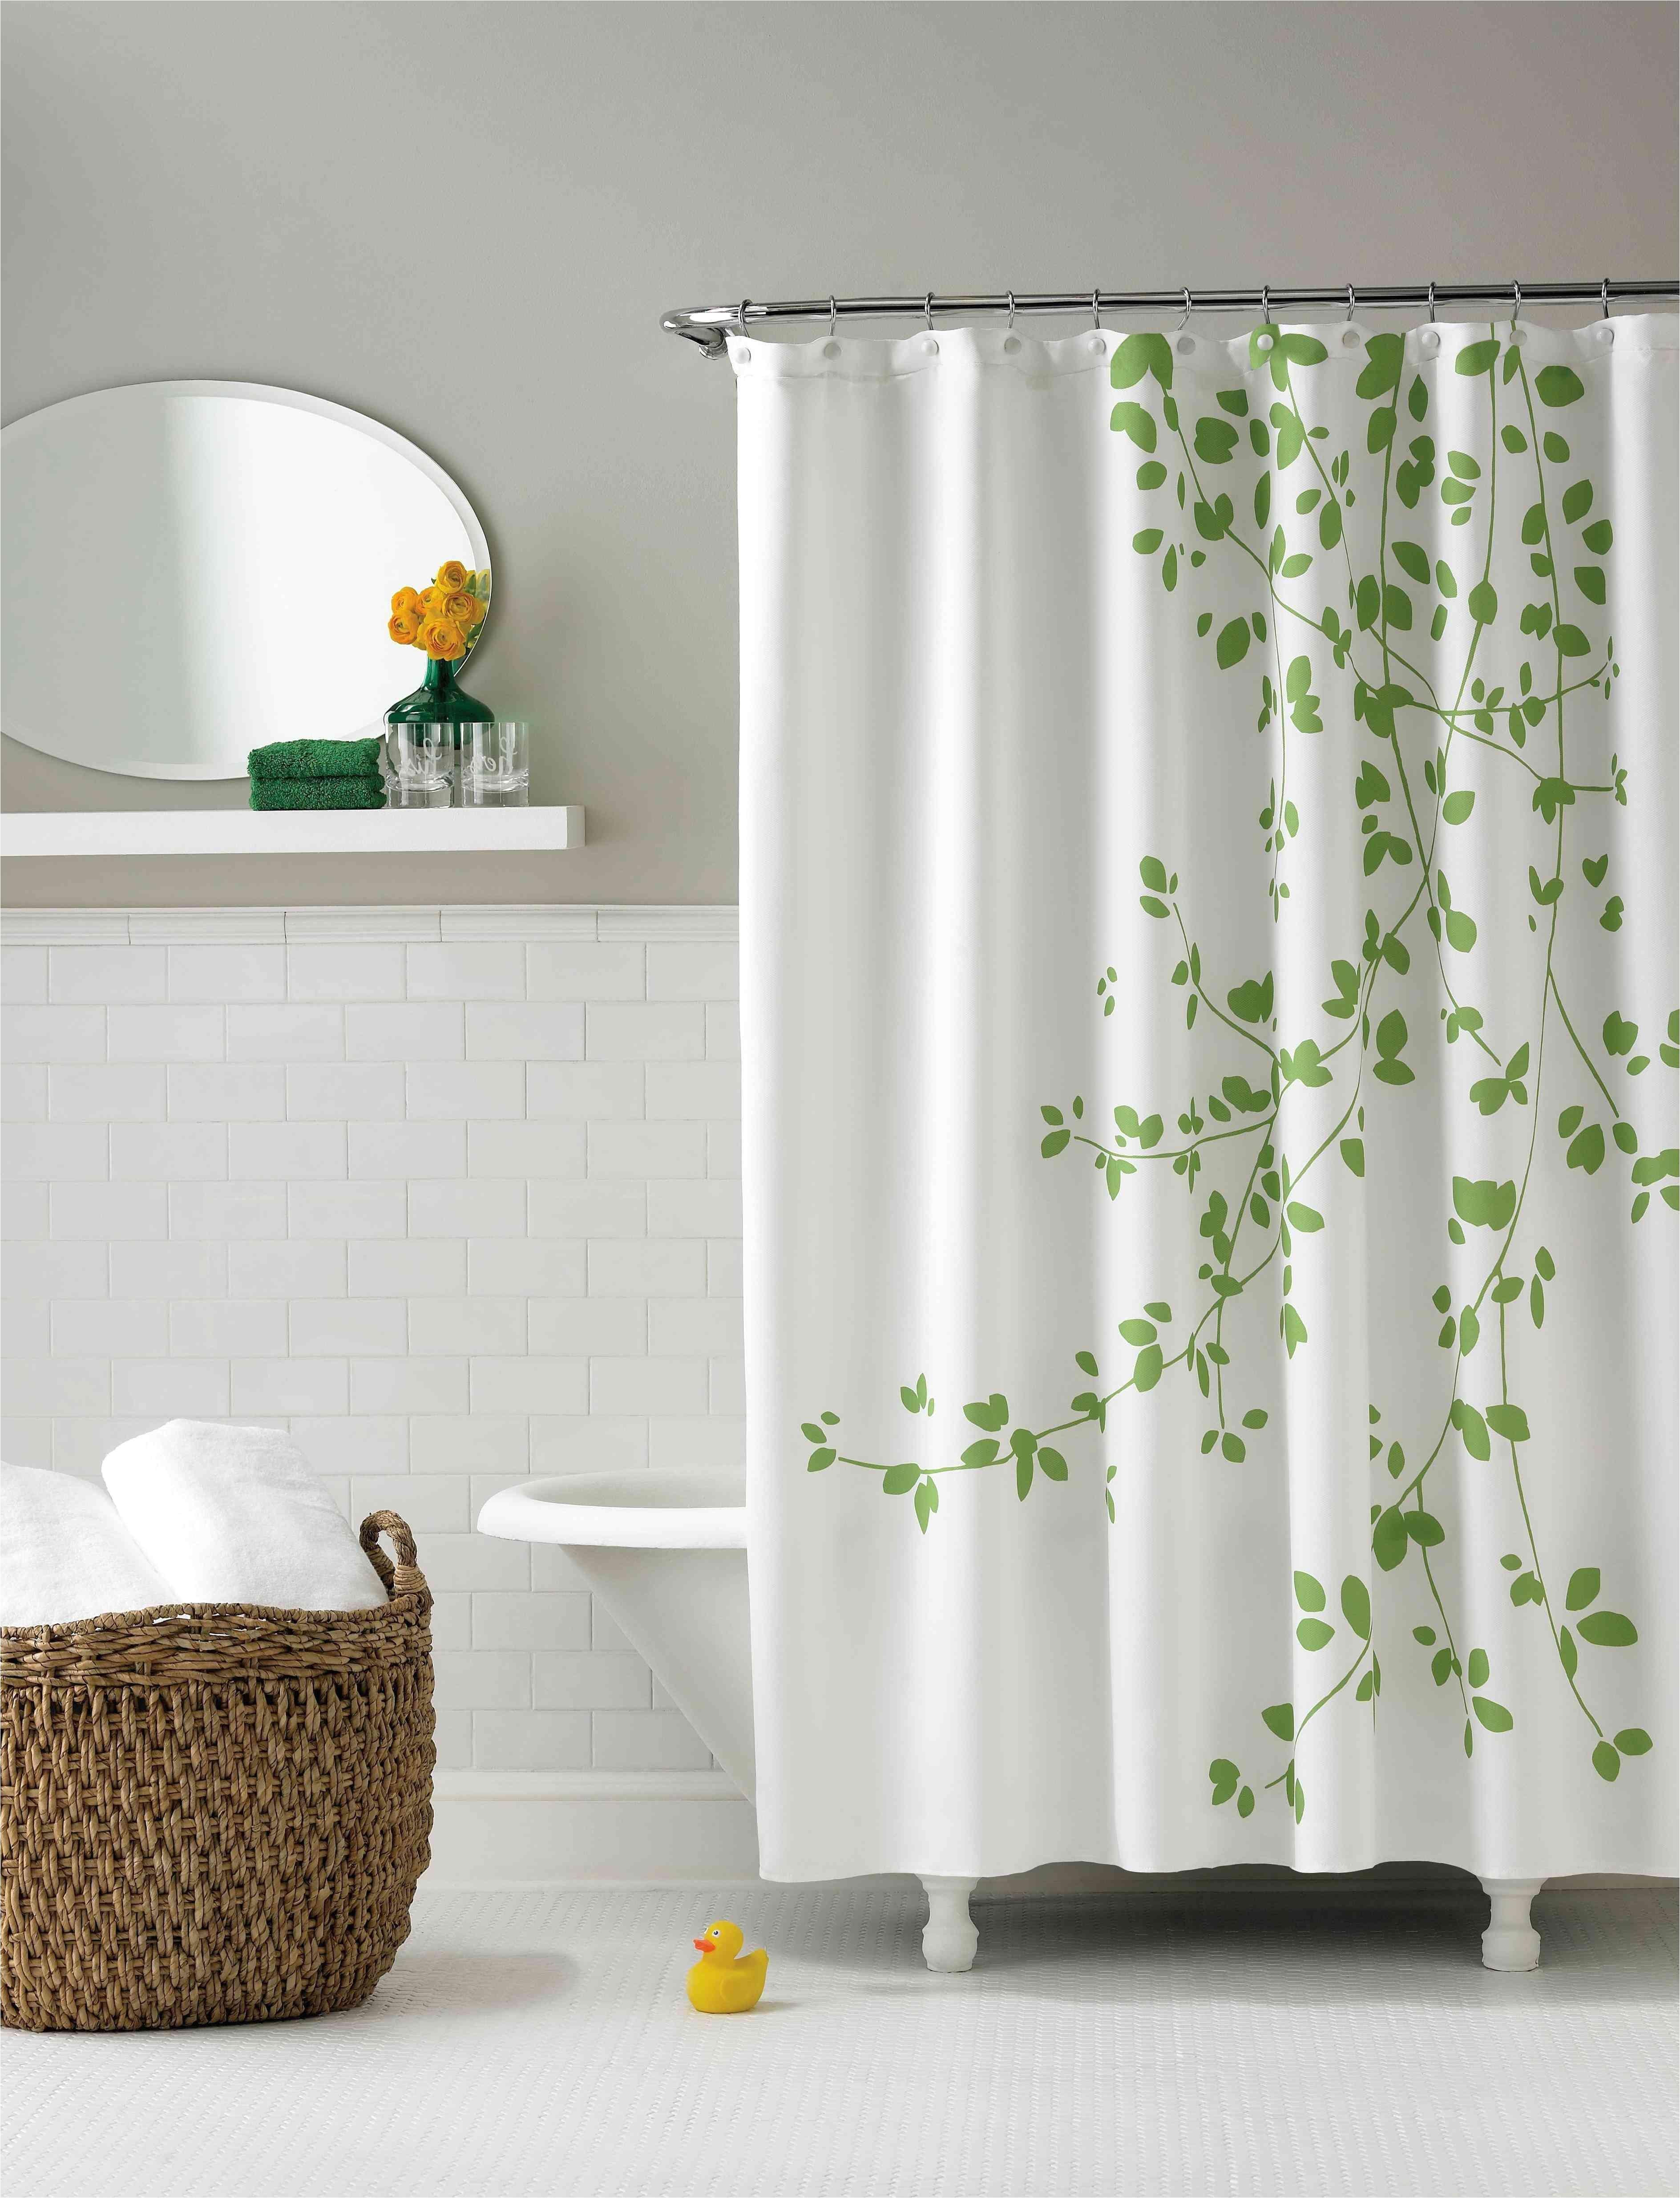 Three Piece Bath Rug Sets 20 Unique Bathroom With Shower Curtain Curtains